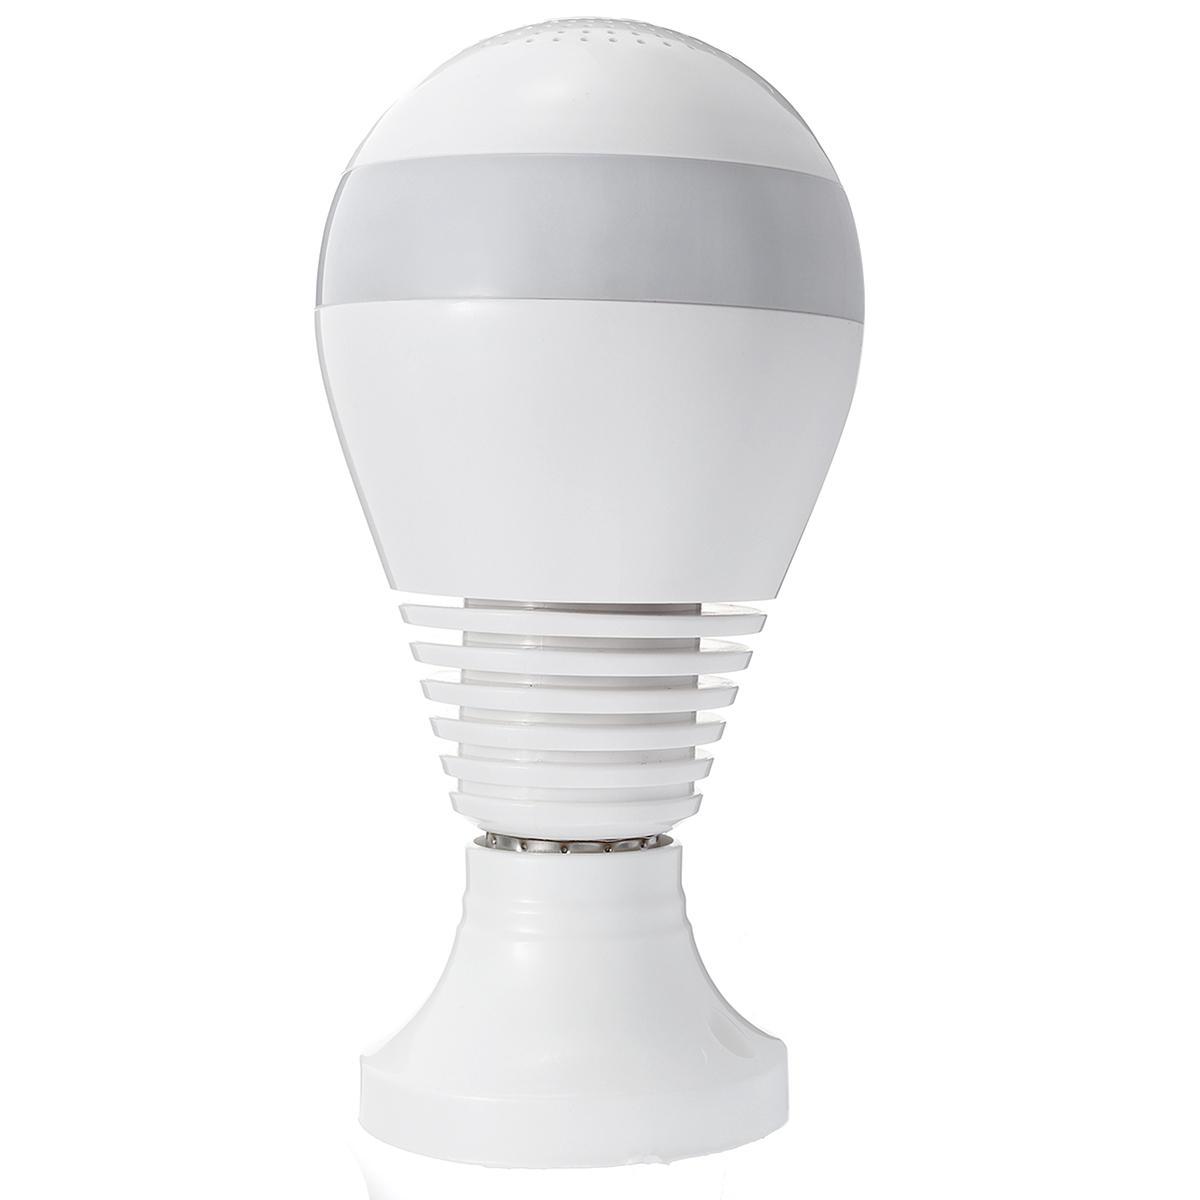 E27 360° Panorámico 1080P IR Cámara Oculta Bombilla de la Luz Ojo de Pez de Wifi CCTV Cámara de Seguridad - 9